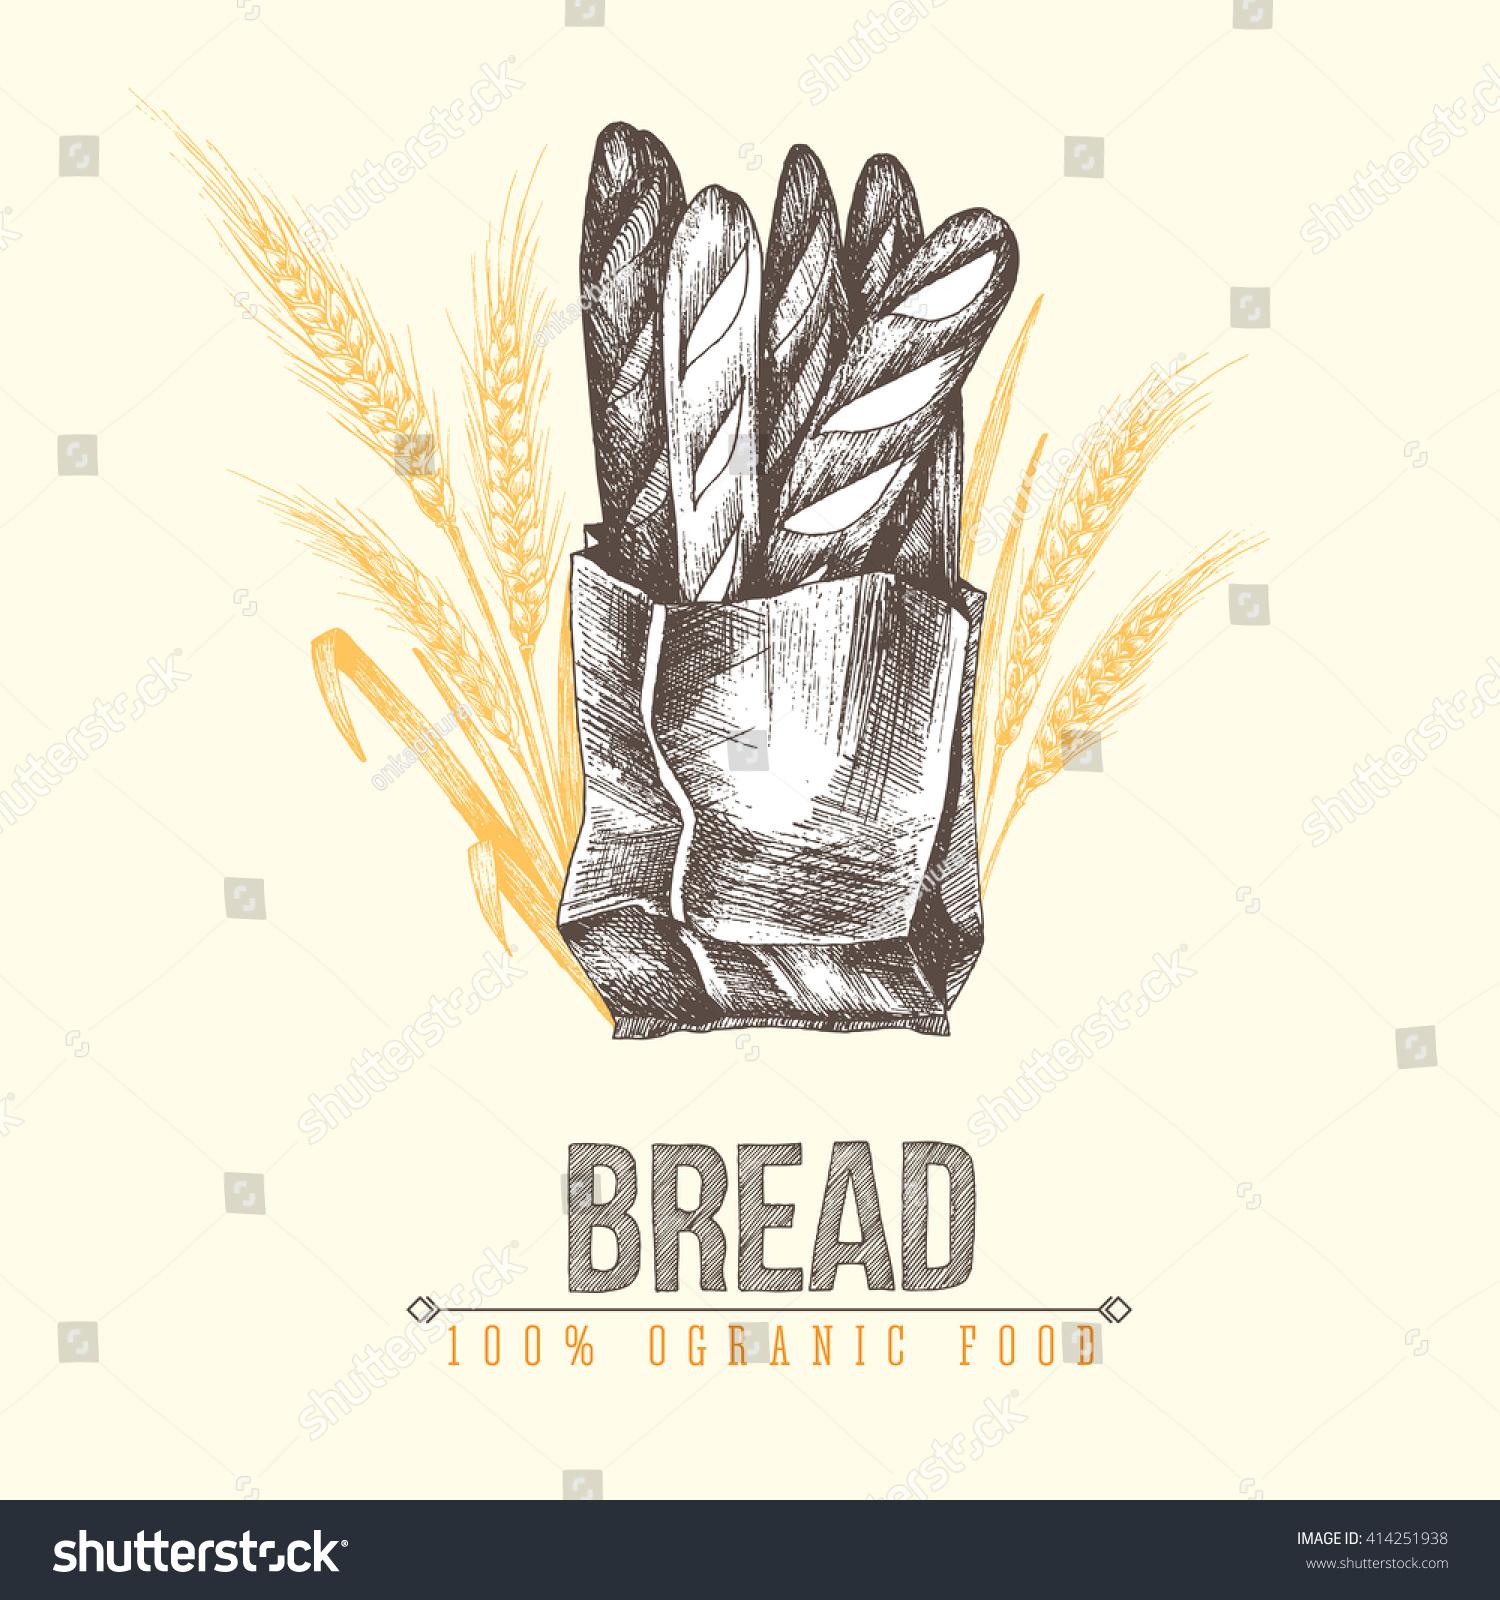 Paper bag sketch - Fresh Baked Baguette Packed In Ecological Paper Bag Vector Hand Drawn Sketch Illustration Of Five